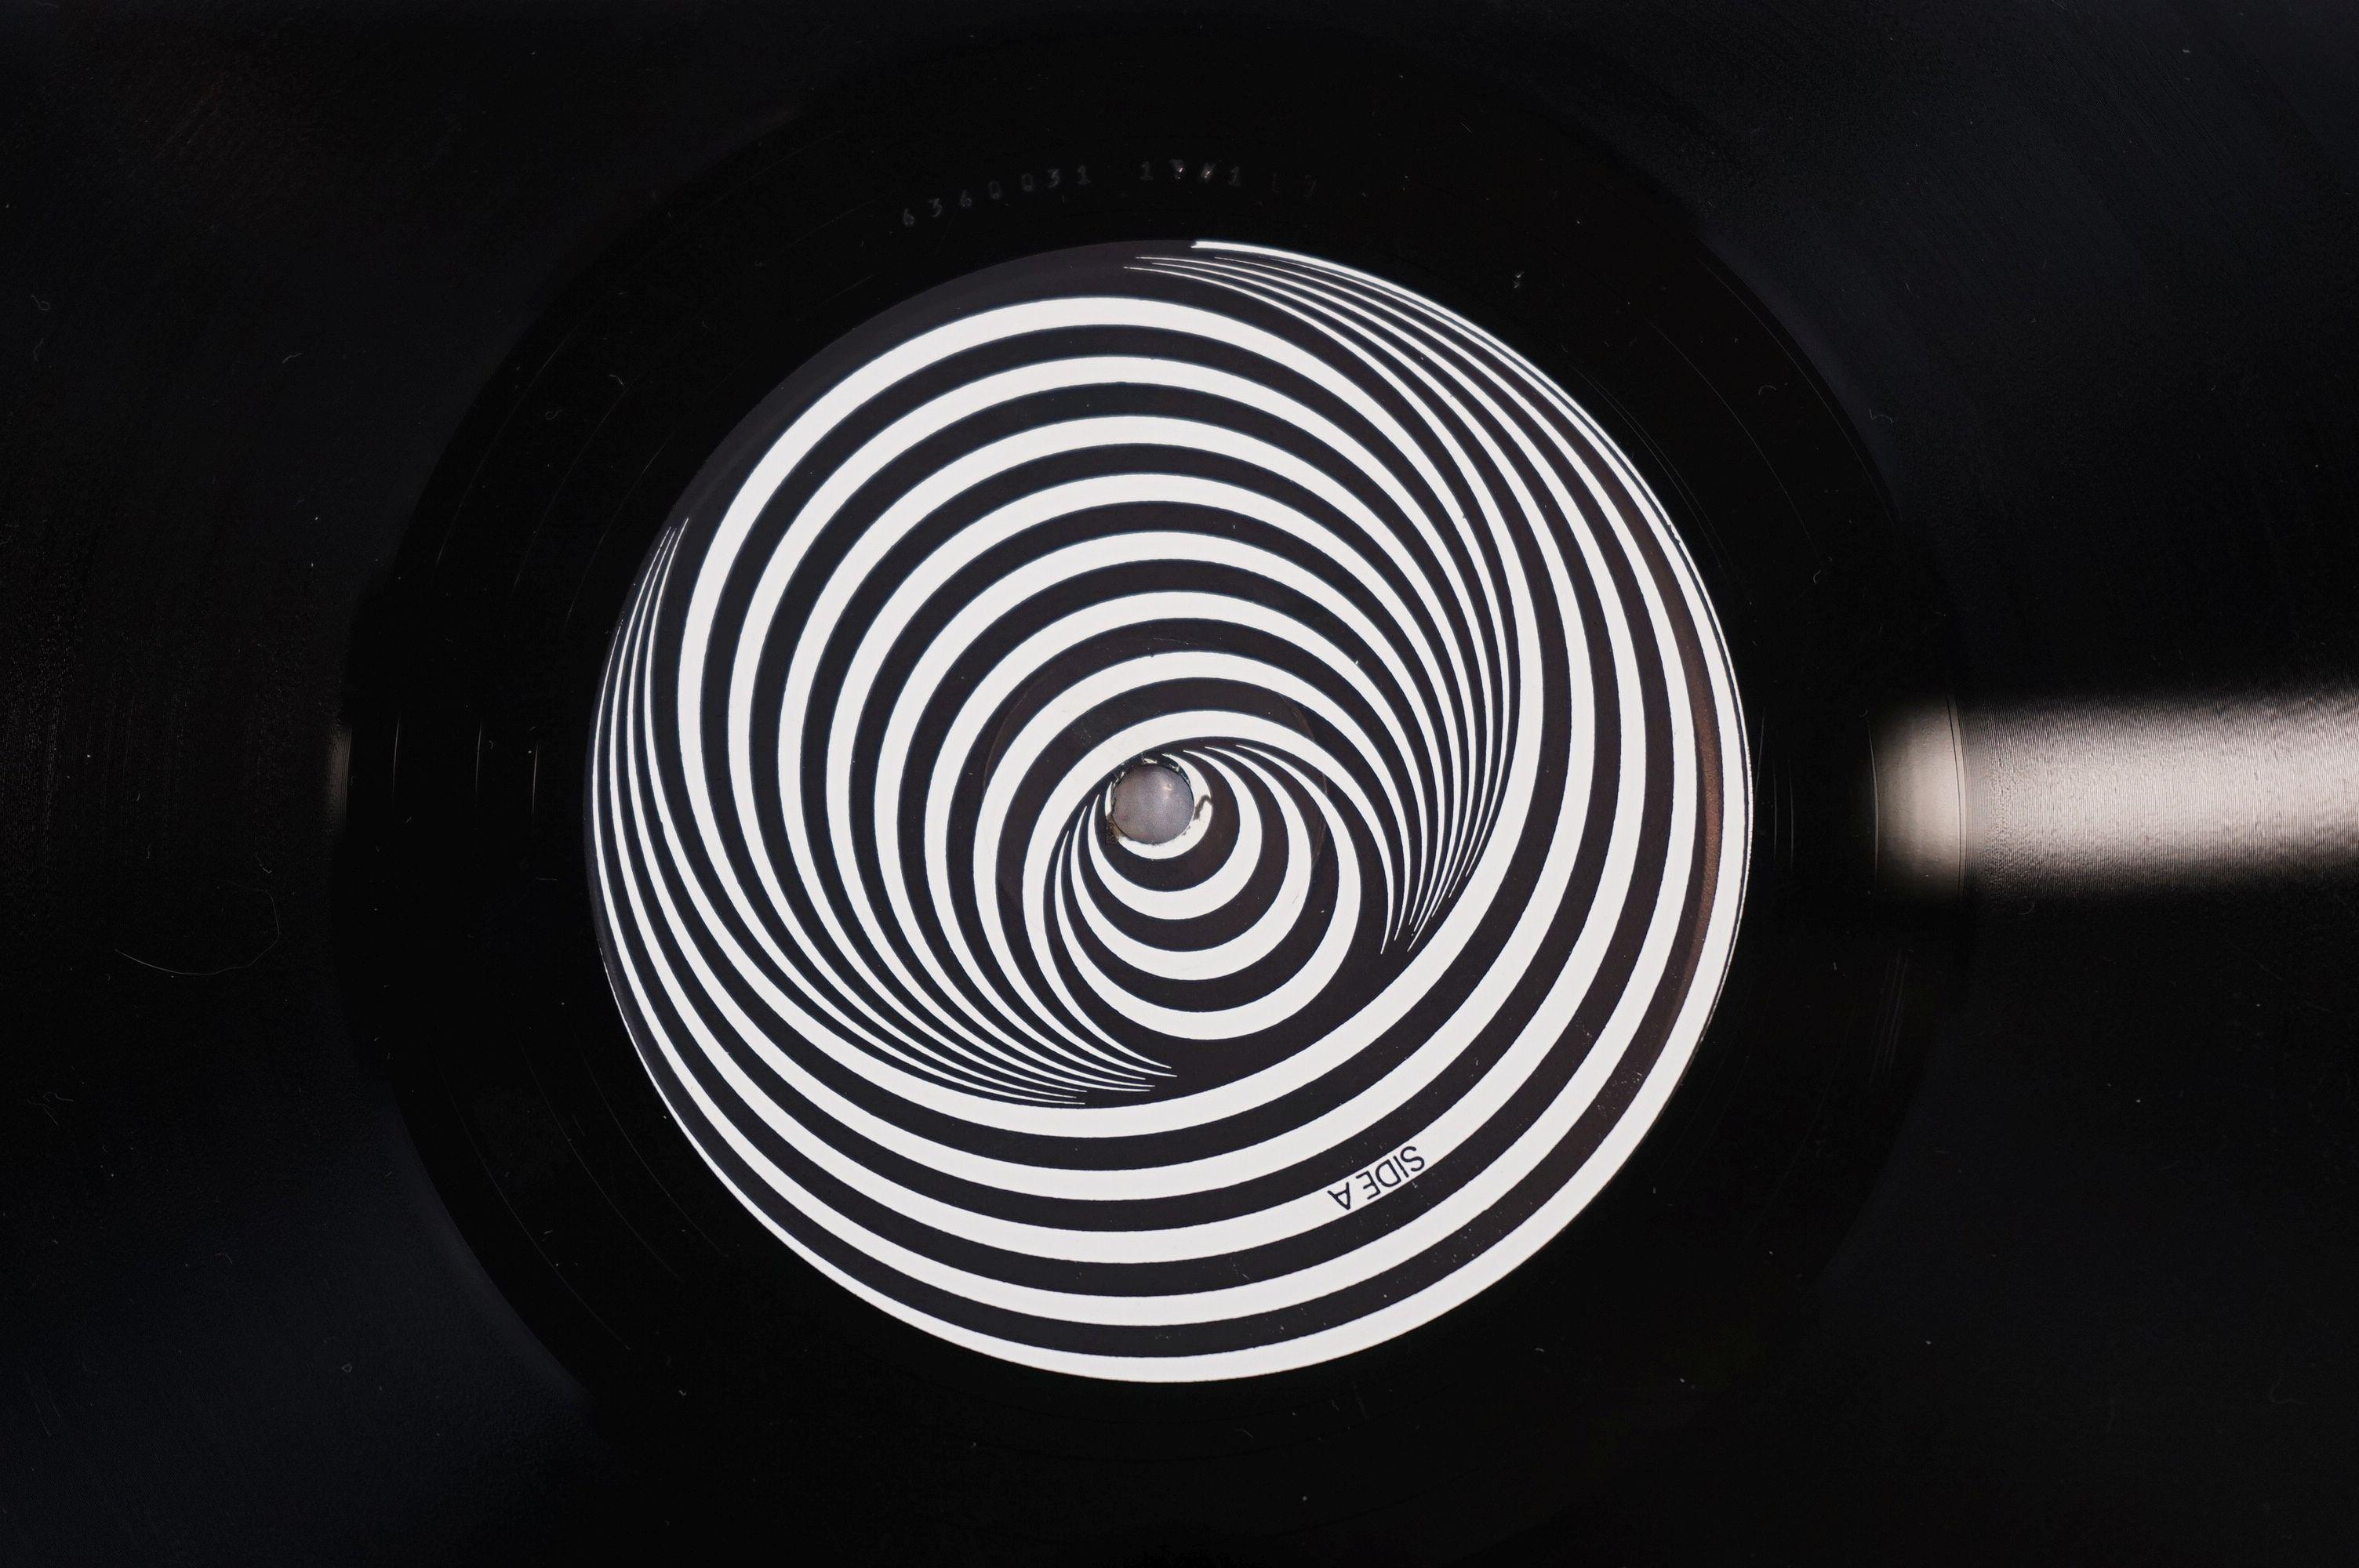 Vinyl - Nirvana Local Anaesthetic LP on Vertigo VO 6360031 gatefold sleeve, swirl logo, swirl - Image 8 of 8